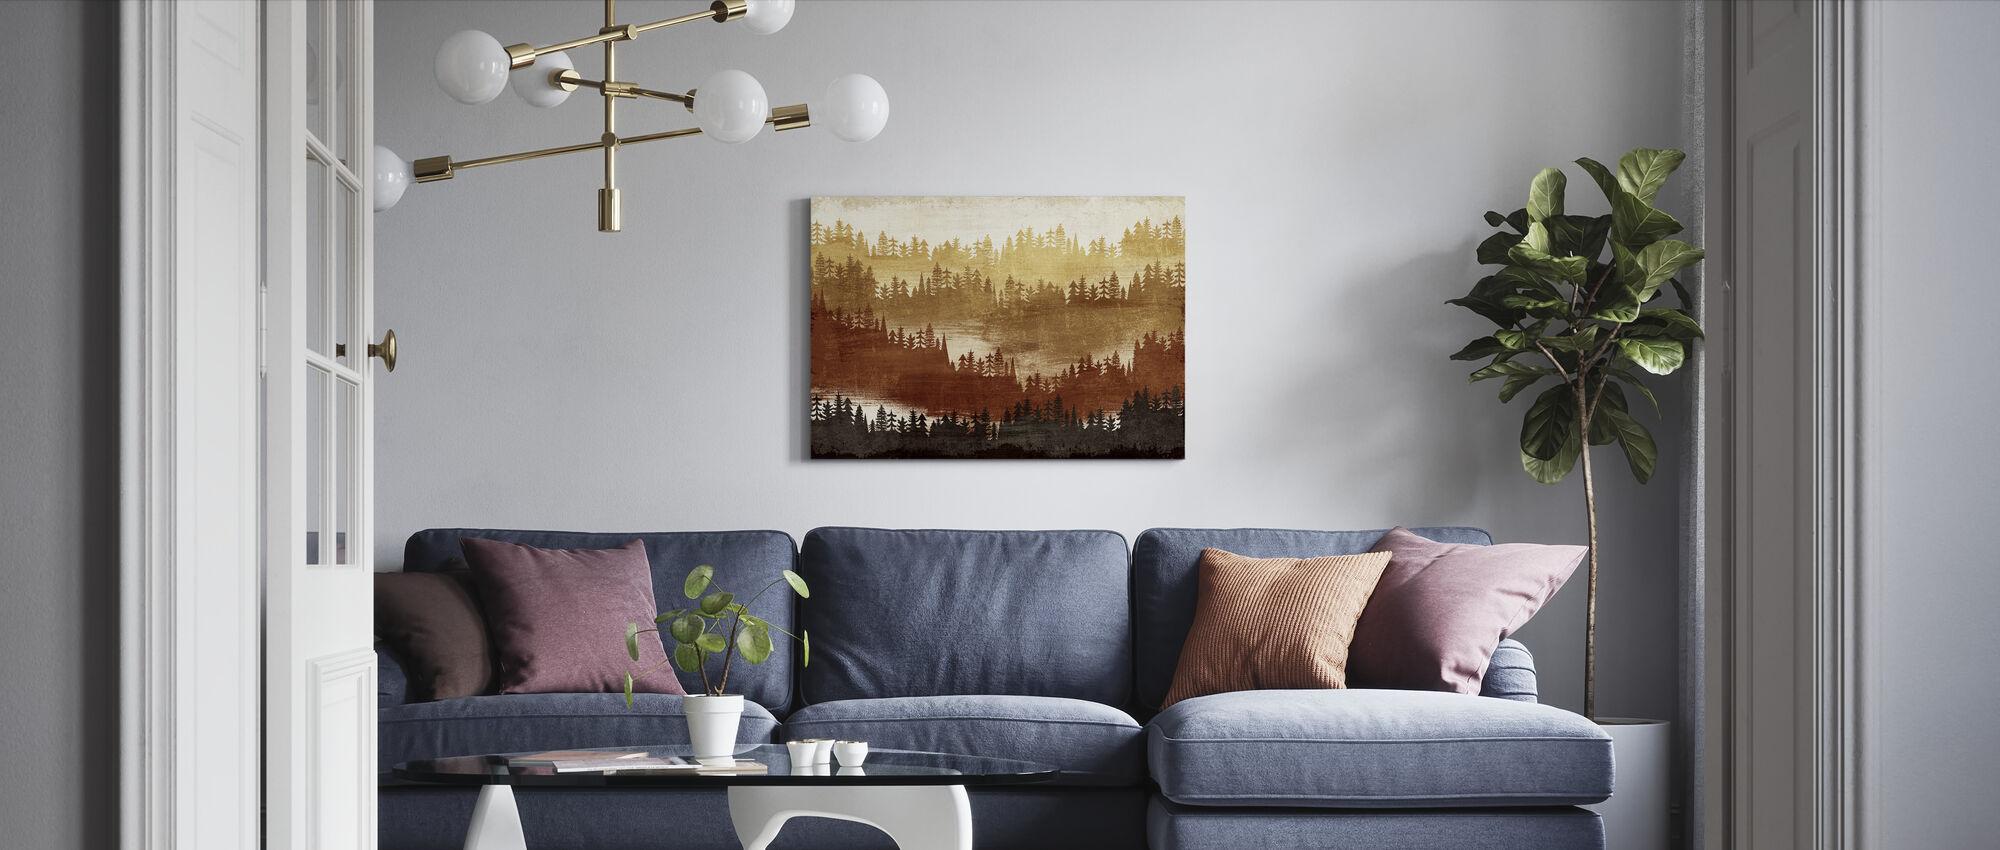 Fjelllandskap Spice - Lerretsbilde - Stue